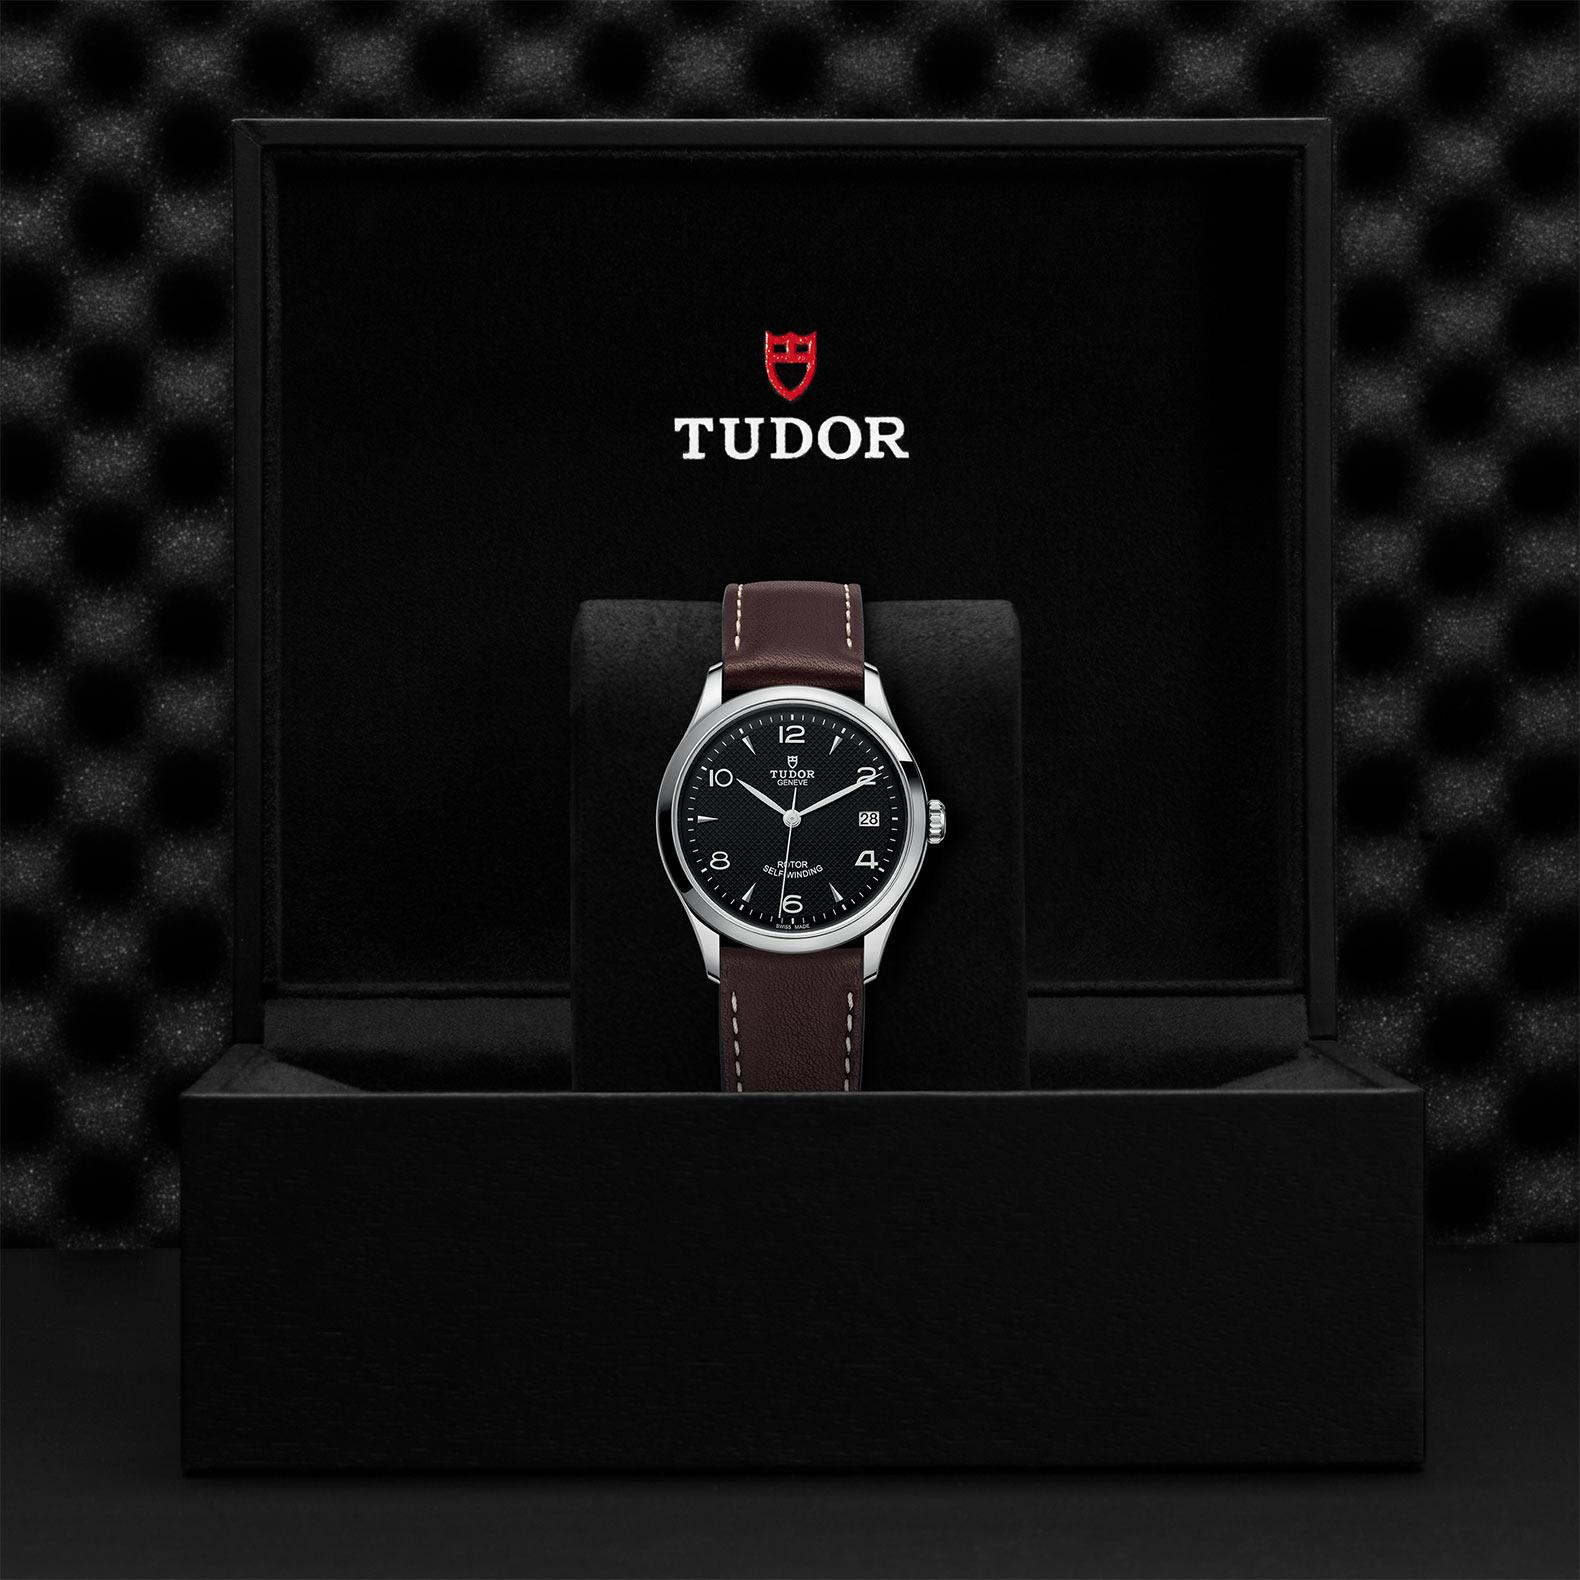 TUDOR 1926 - M91450-0008